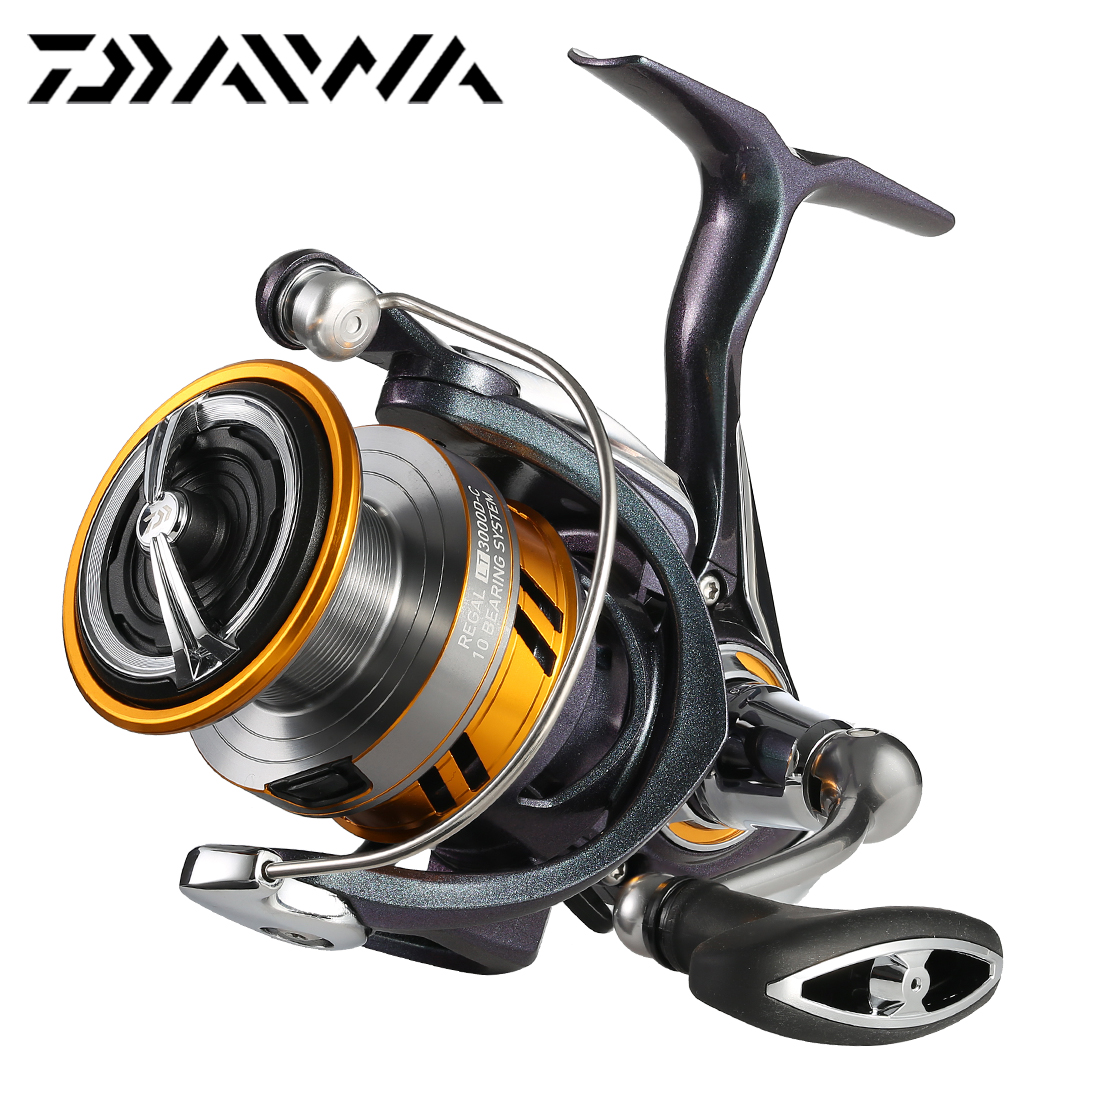 Daiwa Mission CS Spinning Reels 2000 2500 3000 4000 Size Spin Fishing Reel